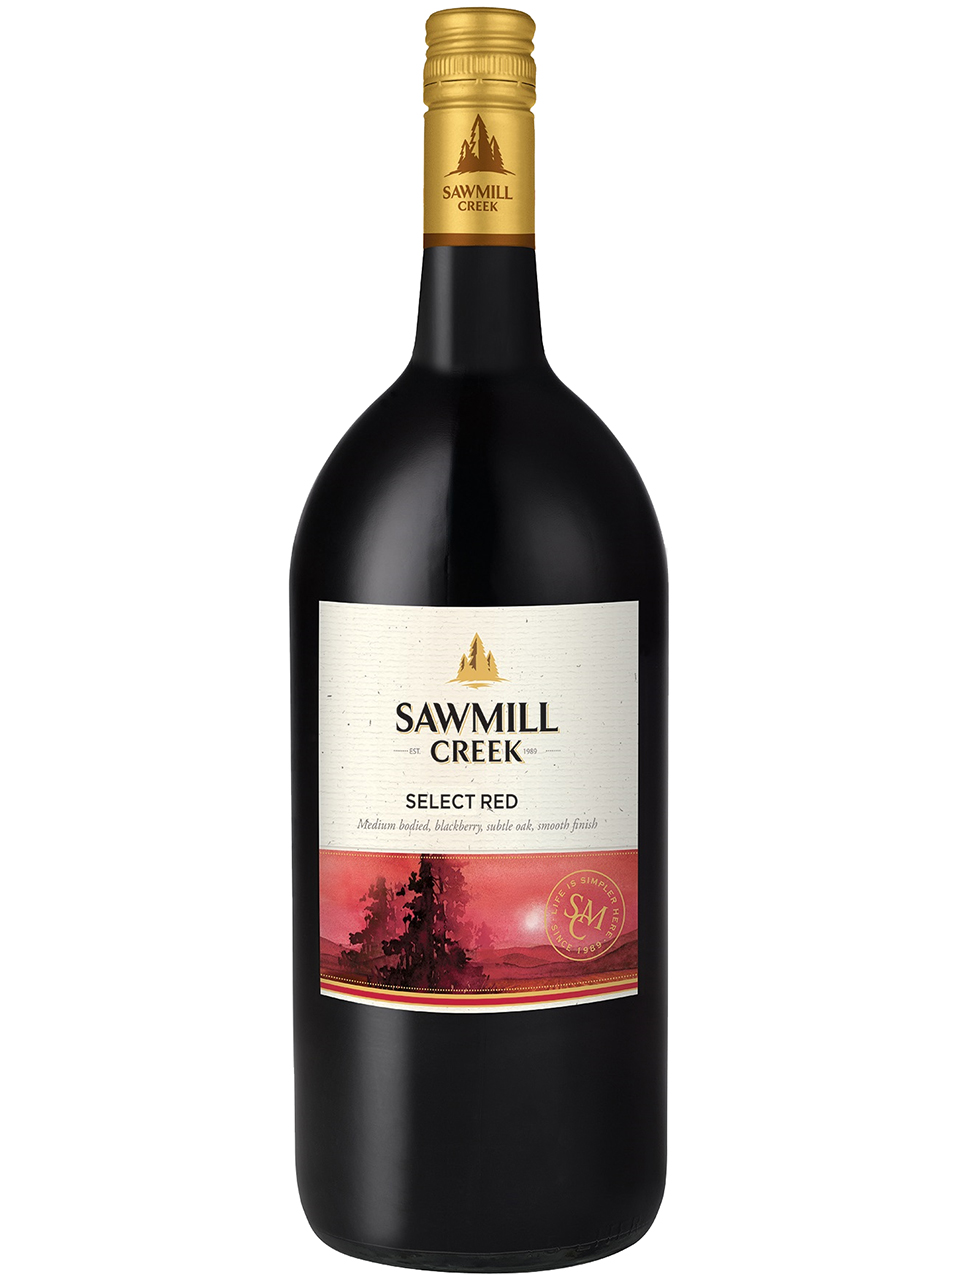 Sawmill Creek Select Red